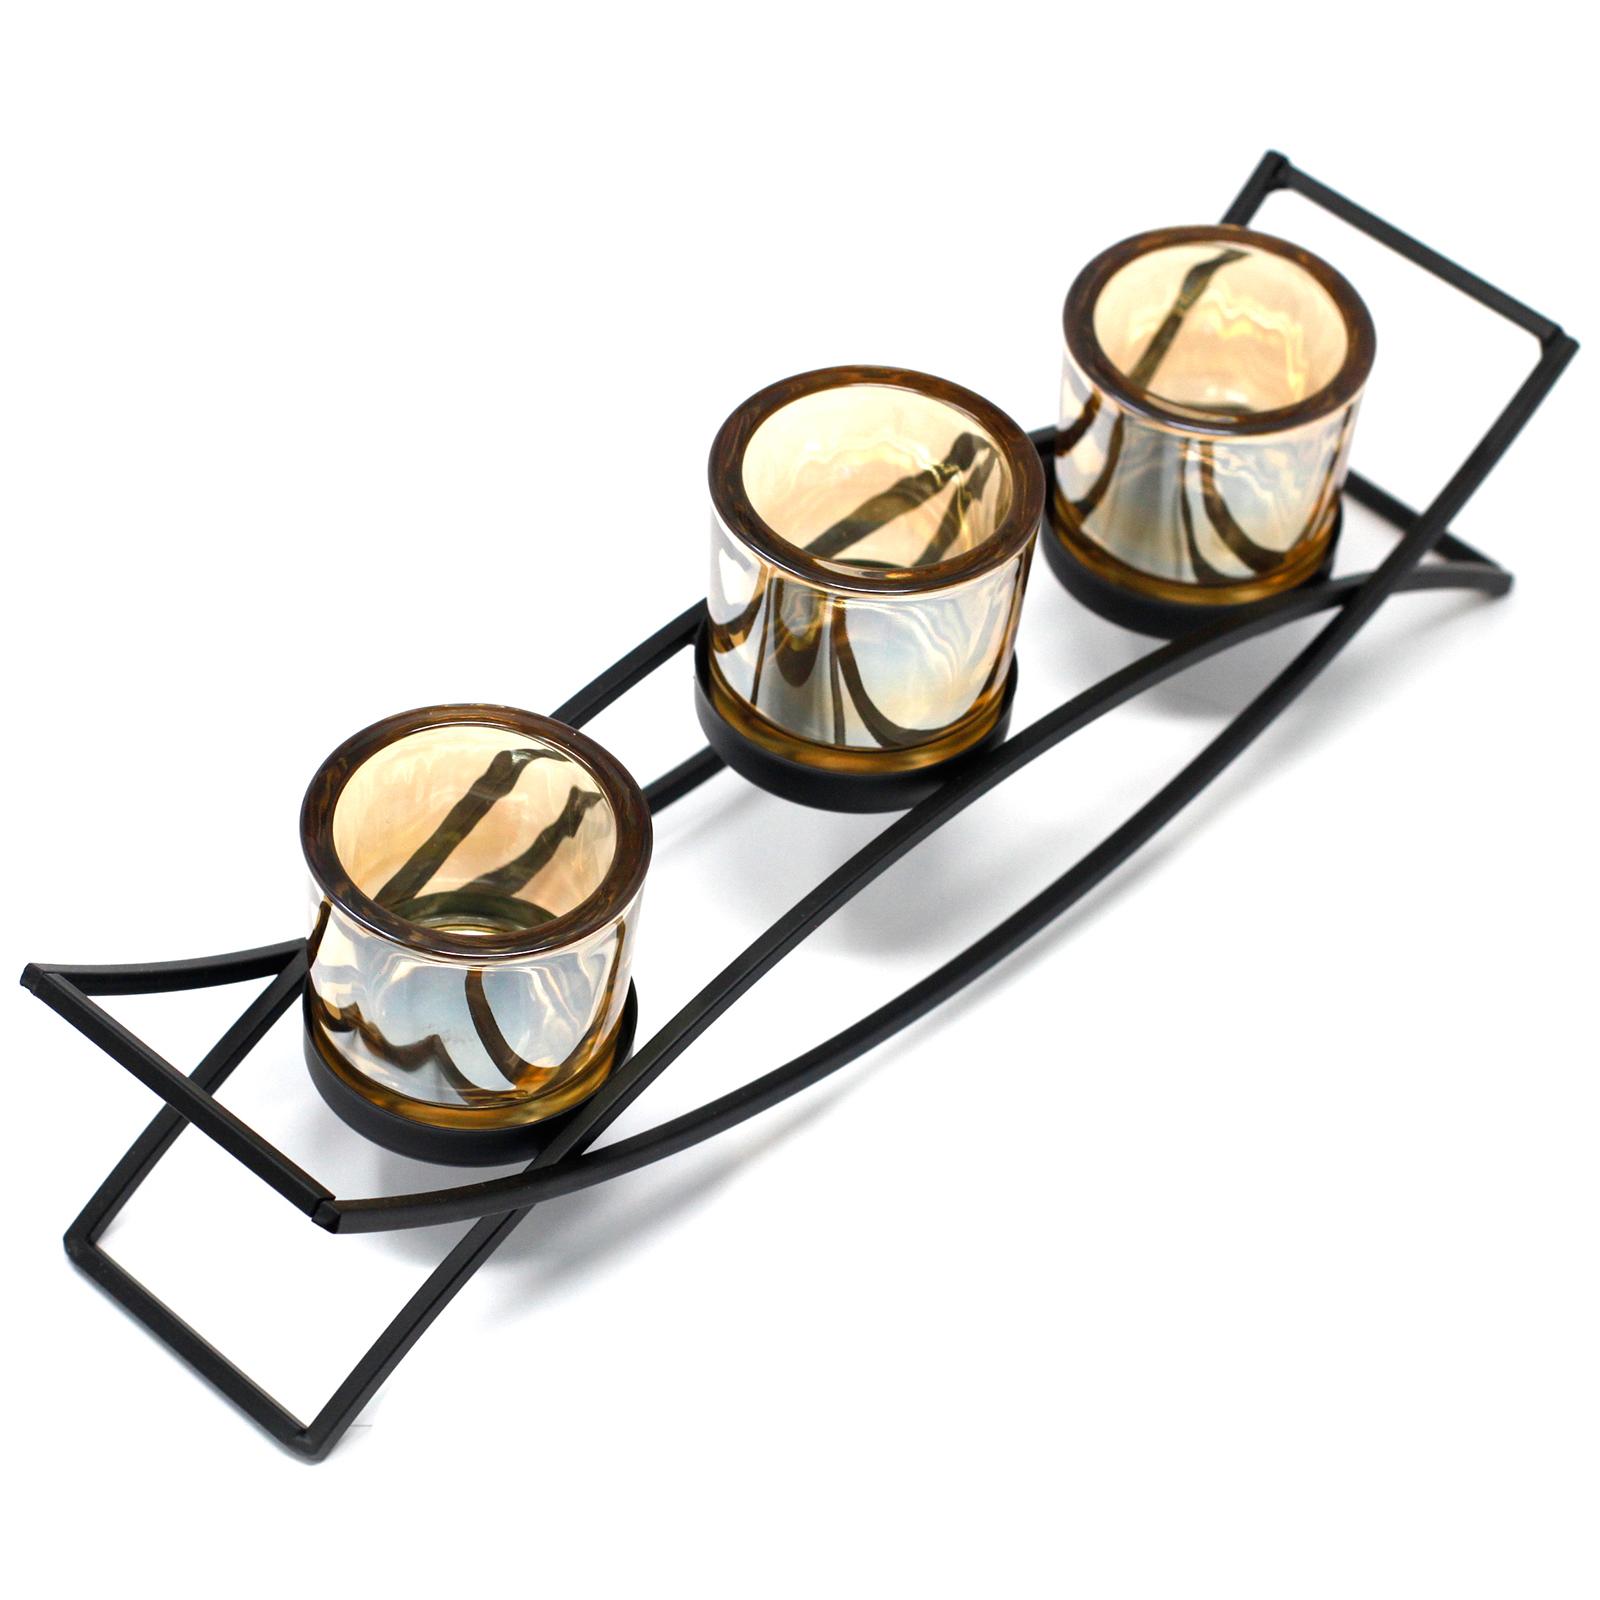 Centrepiece Iron Votive Candle Holder 3 Cup Silluethe